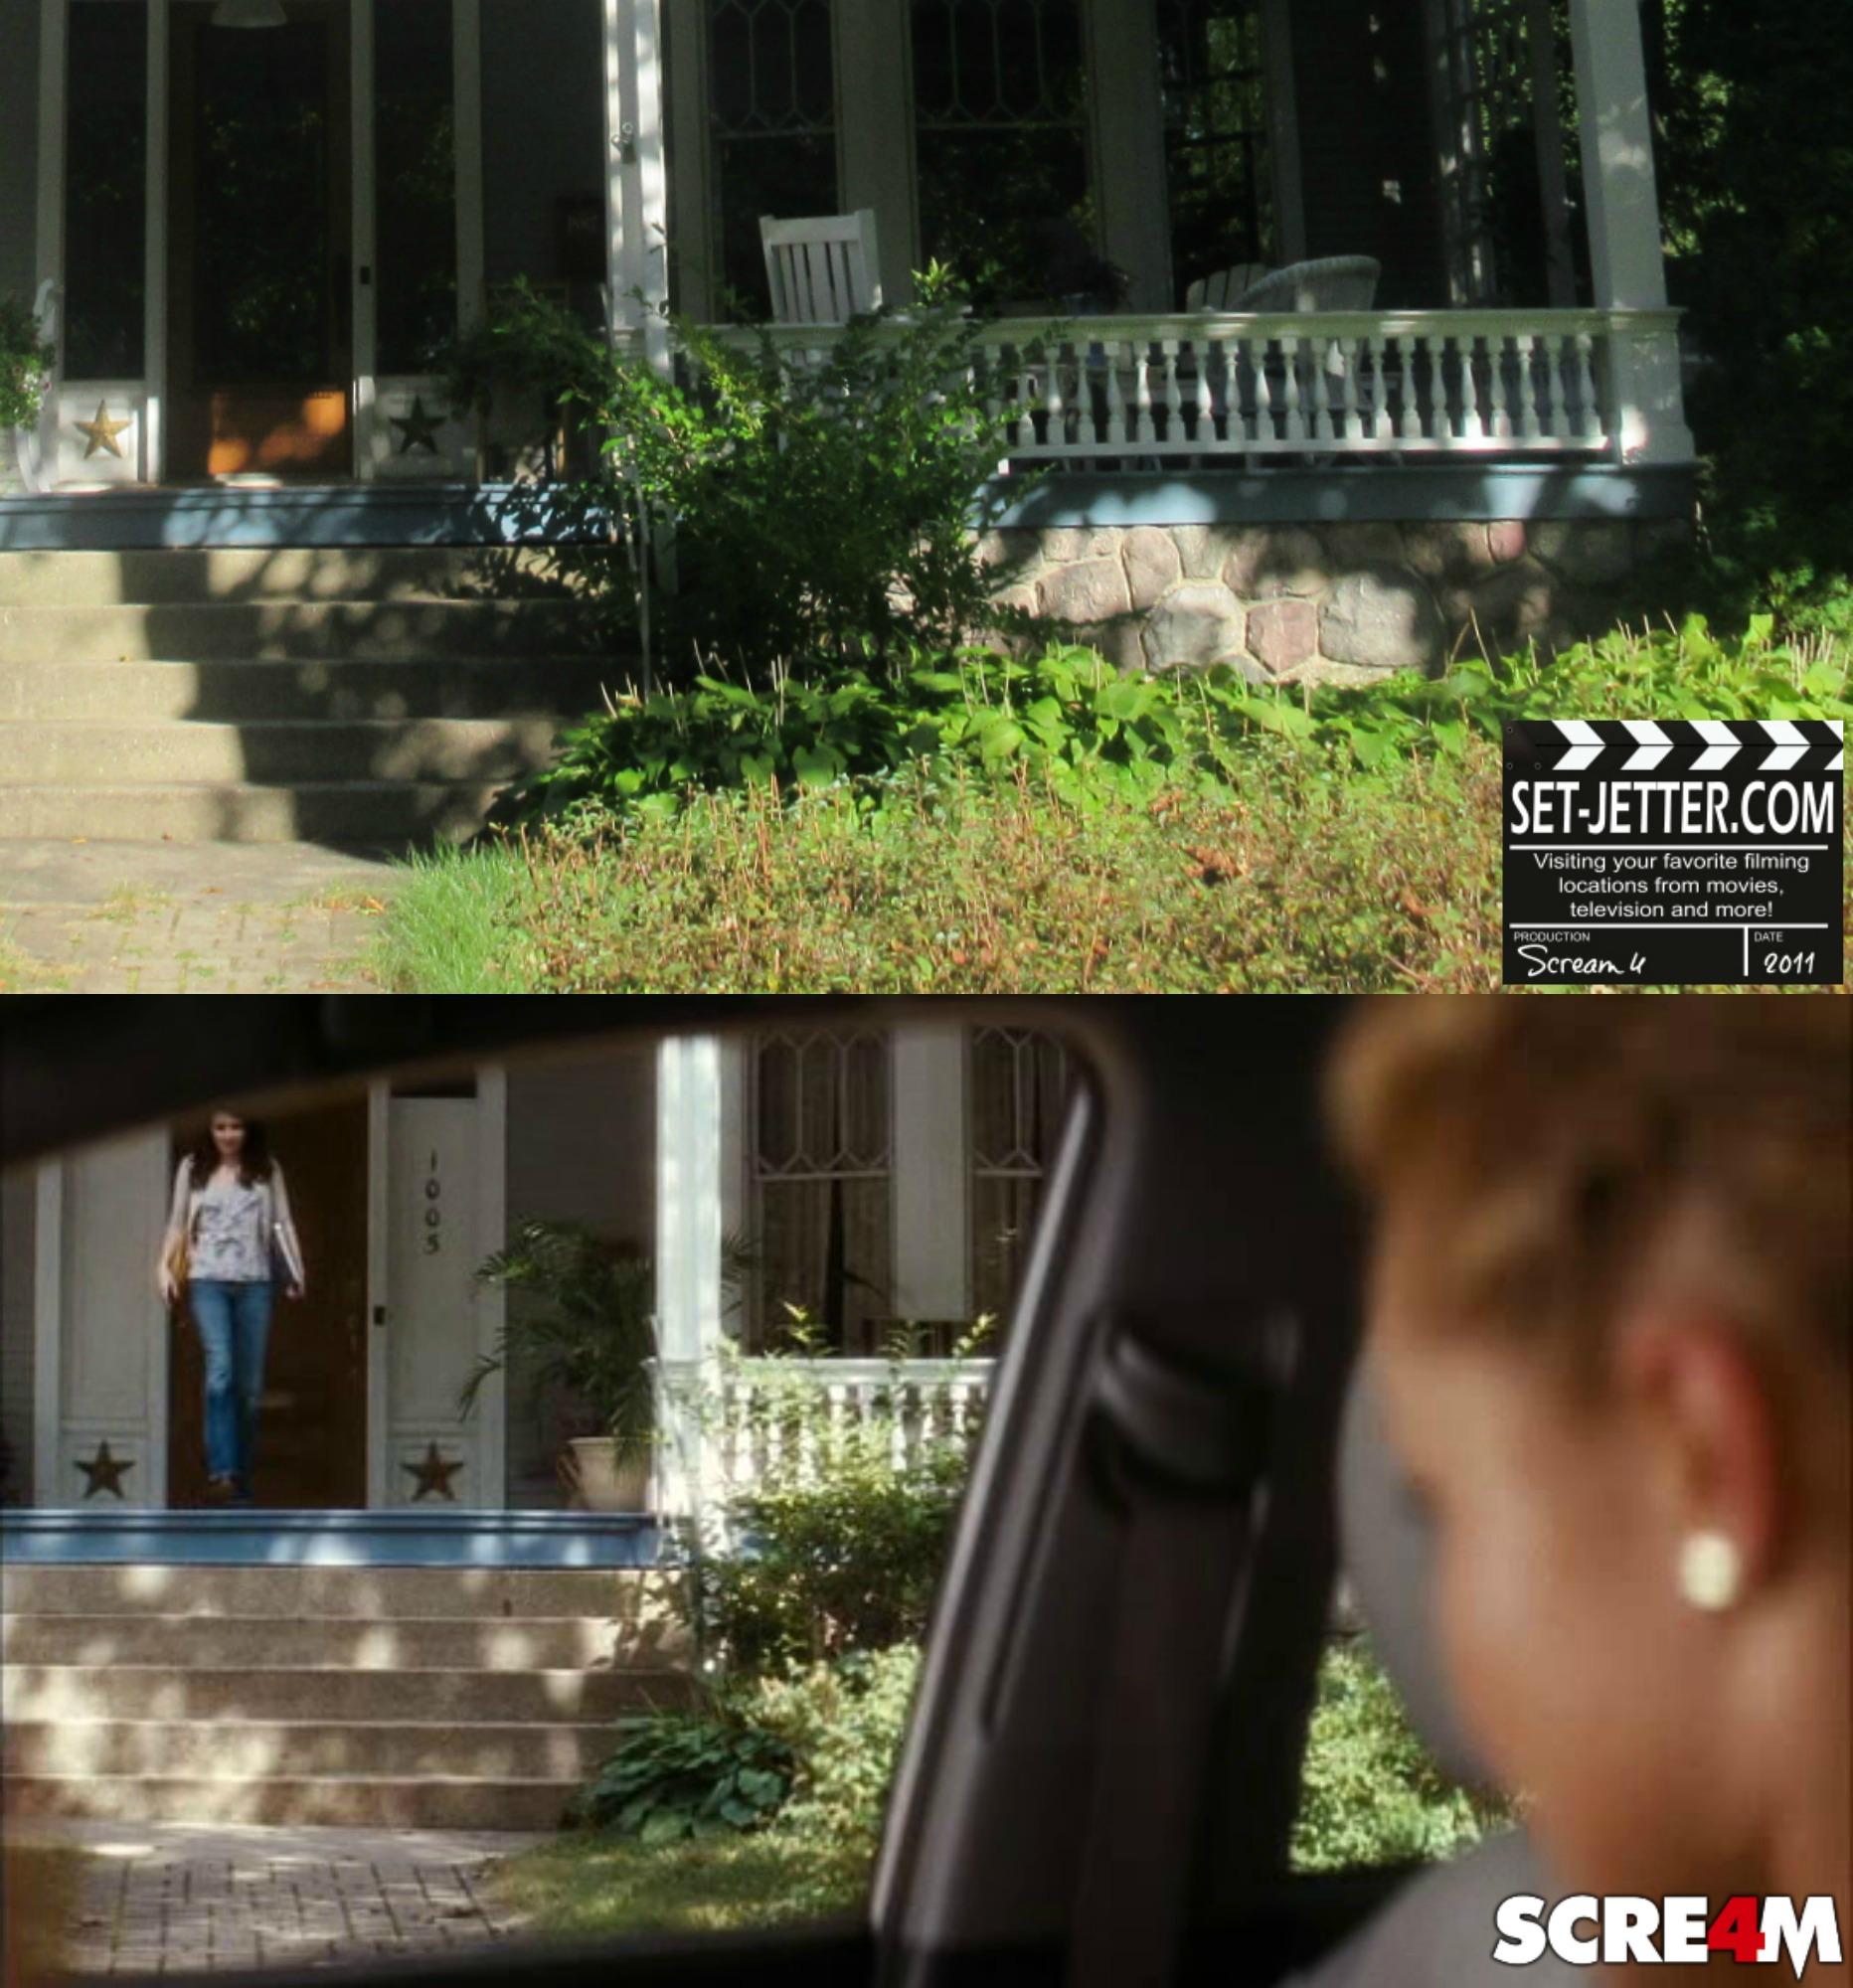 Scream4 comparison 33.jpg